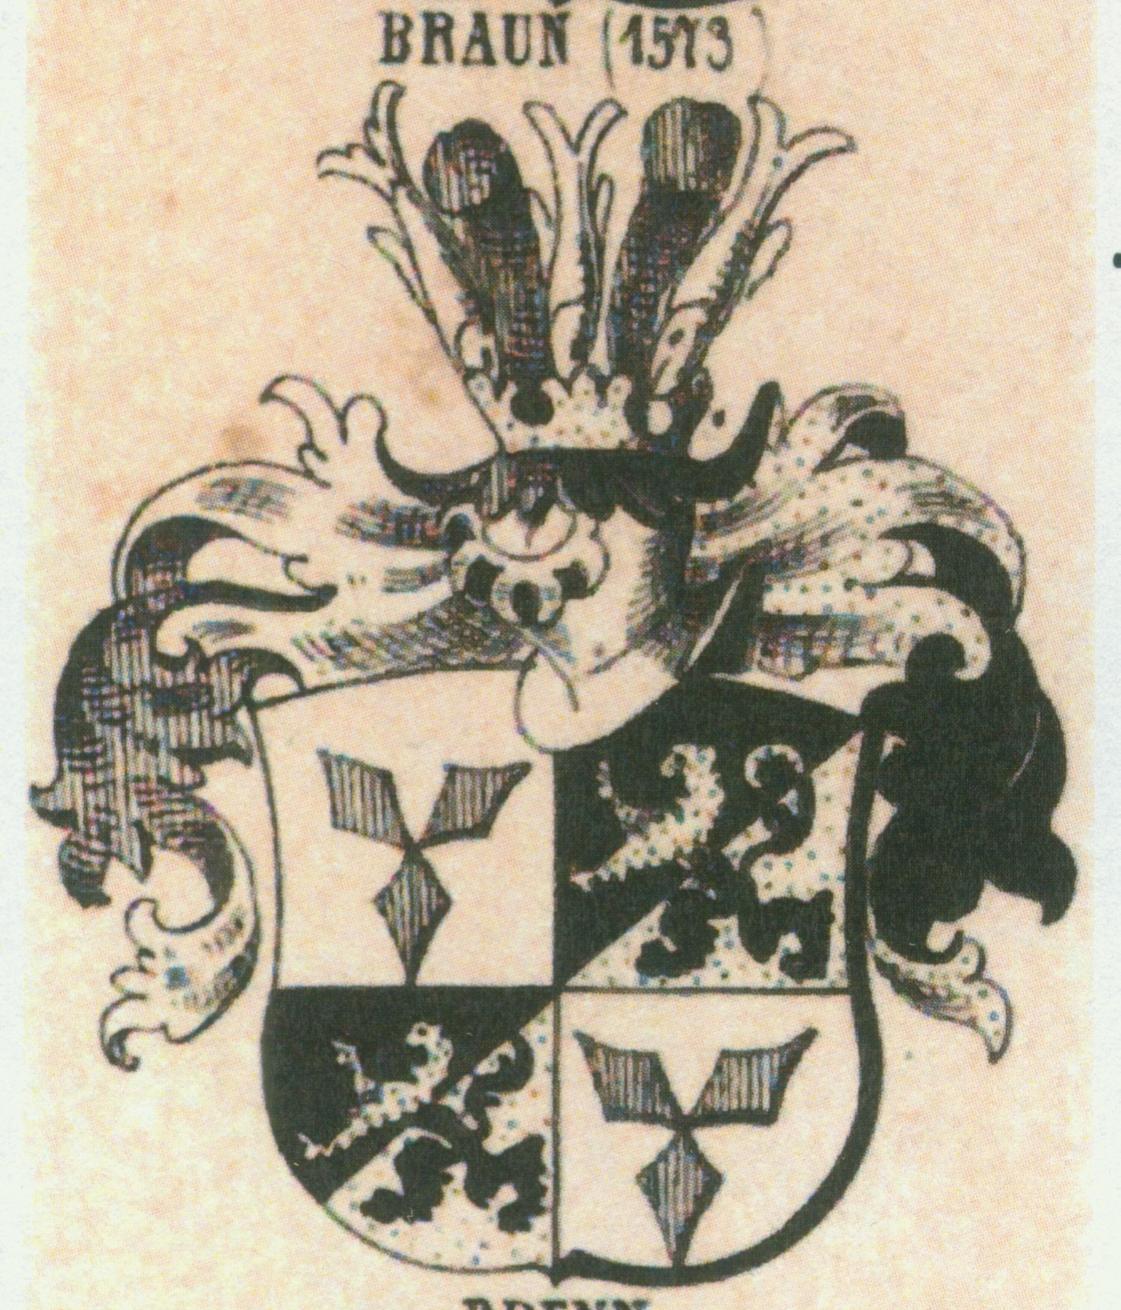 Braun 1573 (2)